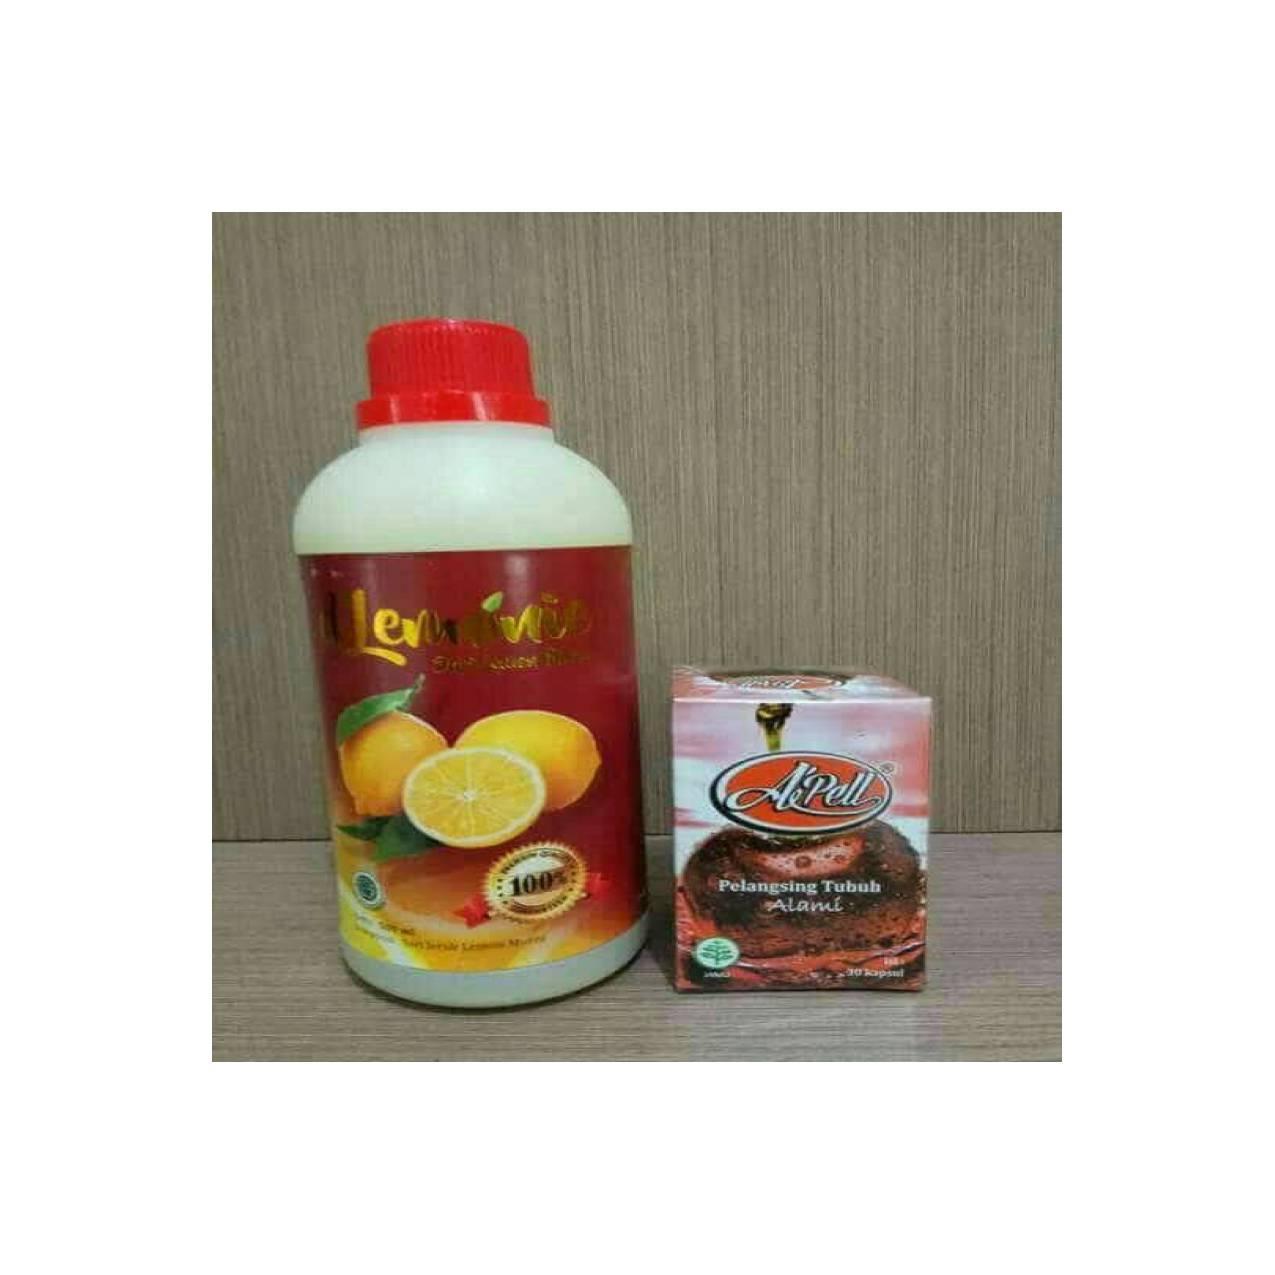 Pelangsing Apel Sari Lemon Dlemonie 500ml Cek Harga Terkini Dan 1000ml 1l 7sunday Rasa Juara Dunia